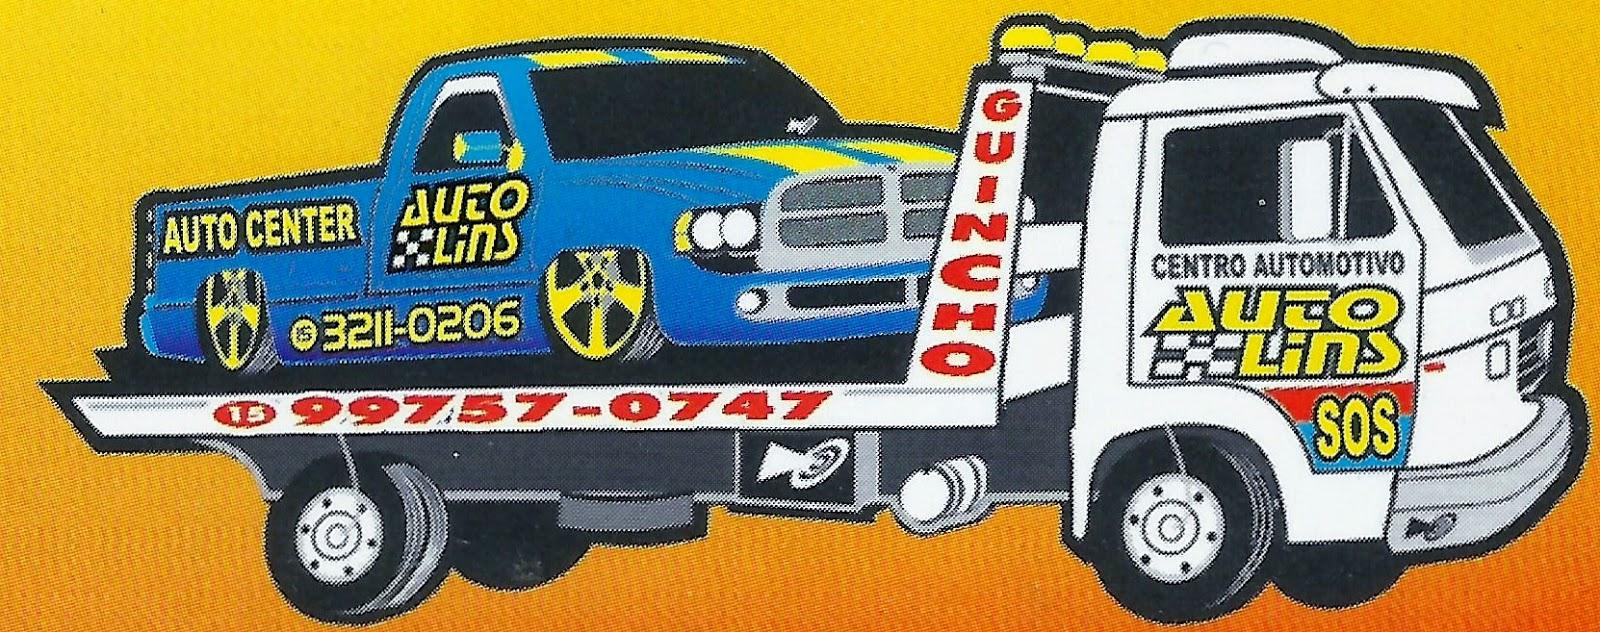 CENTRO AUTOMOTIVO AUTO LINS Av. Itavuvu, 338 - Sorocaba - SP tel: (15) 3211-0206 (15) 99757-0747 Nextel: ID 82*61 185